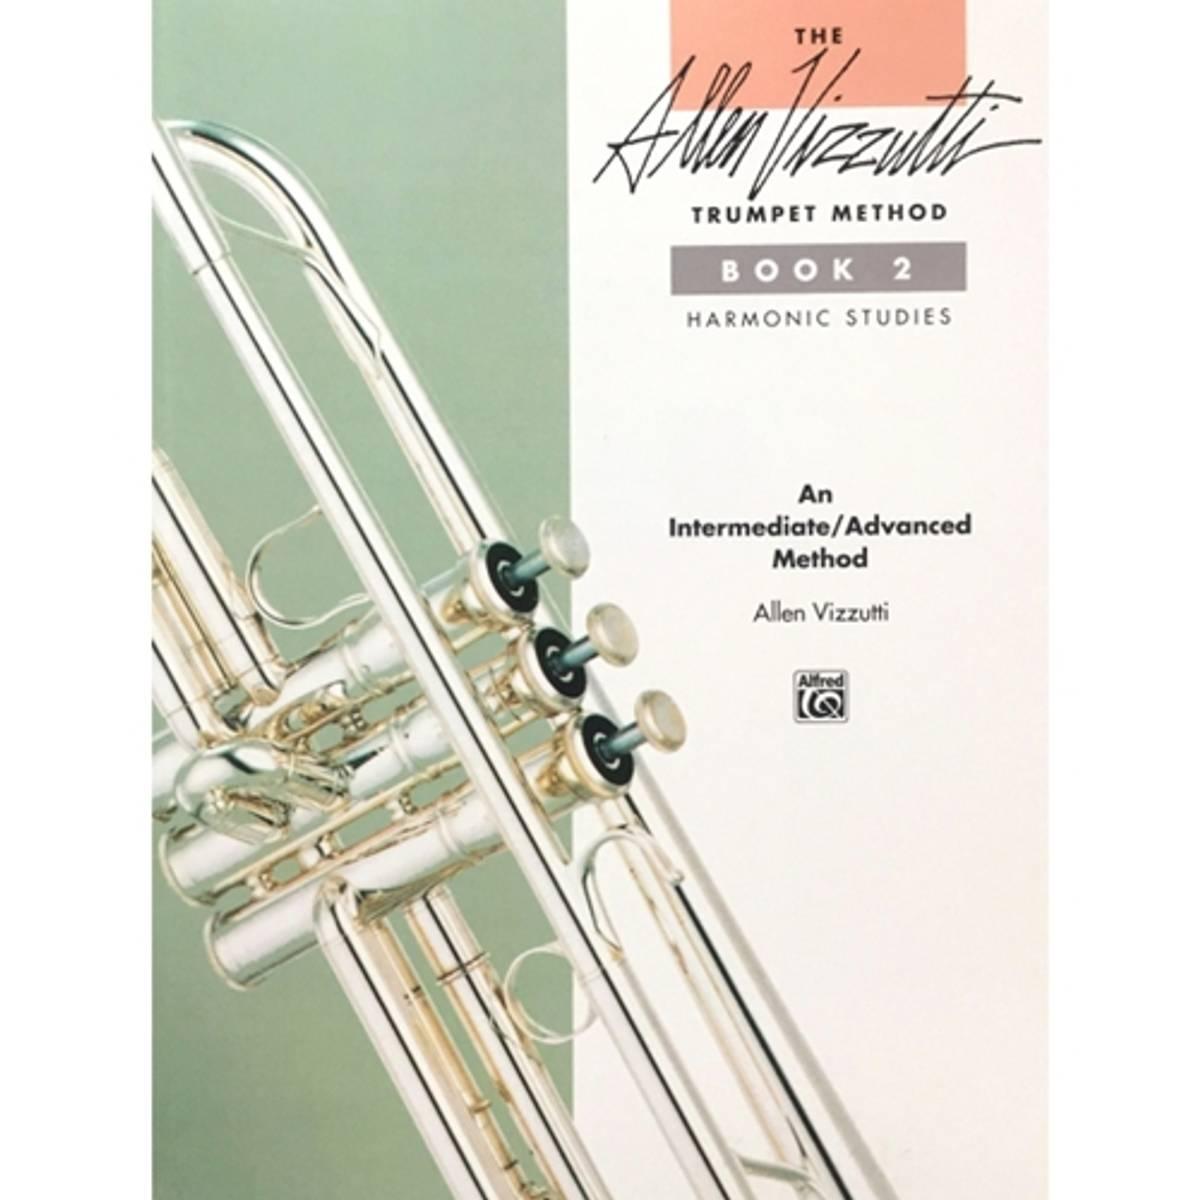 Allan Vizzutti Trumpet Method Vol. 2